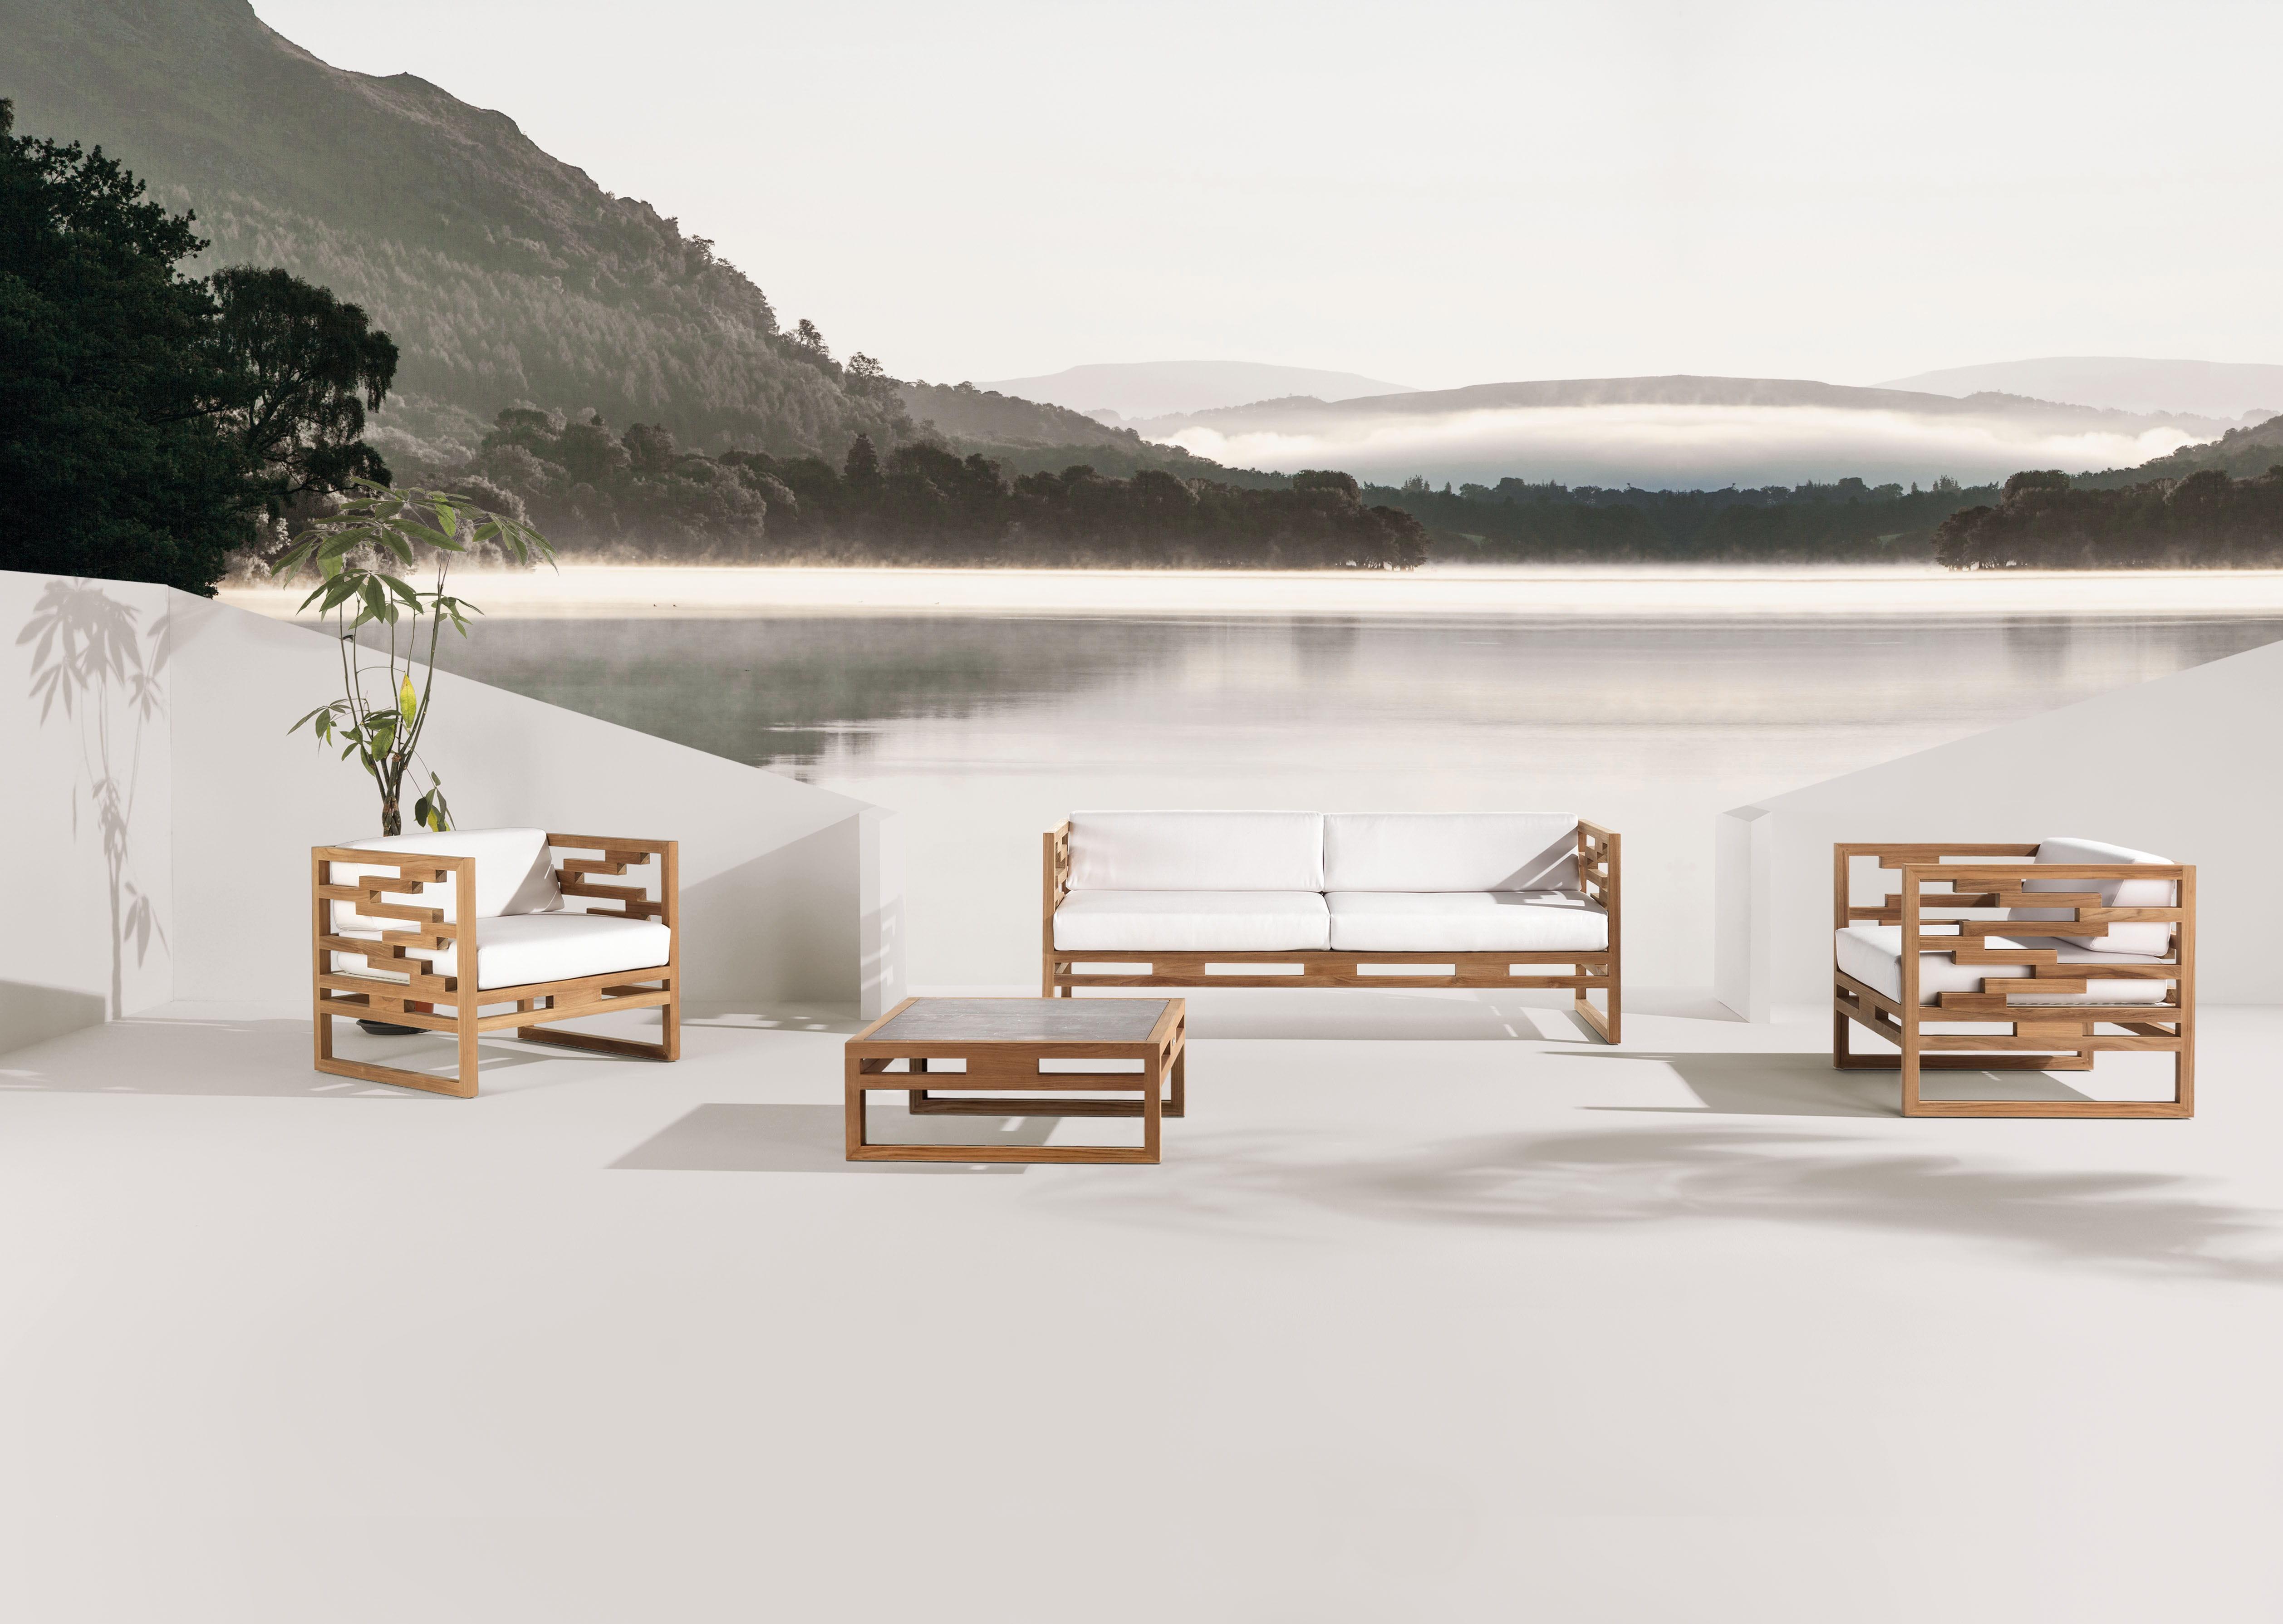 Salon de jardin kontiki chez emu salon de jardin 20 ensembles outdoor en - Salon de jardin 3 suisses ...